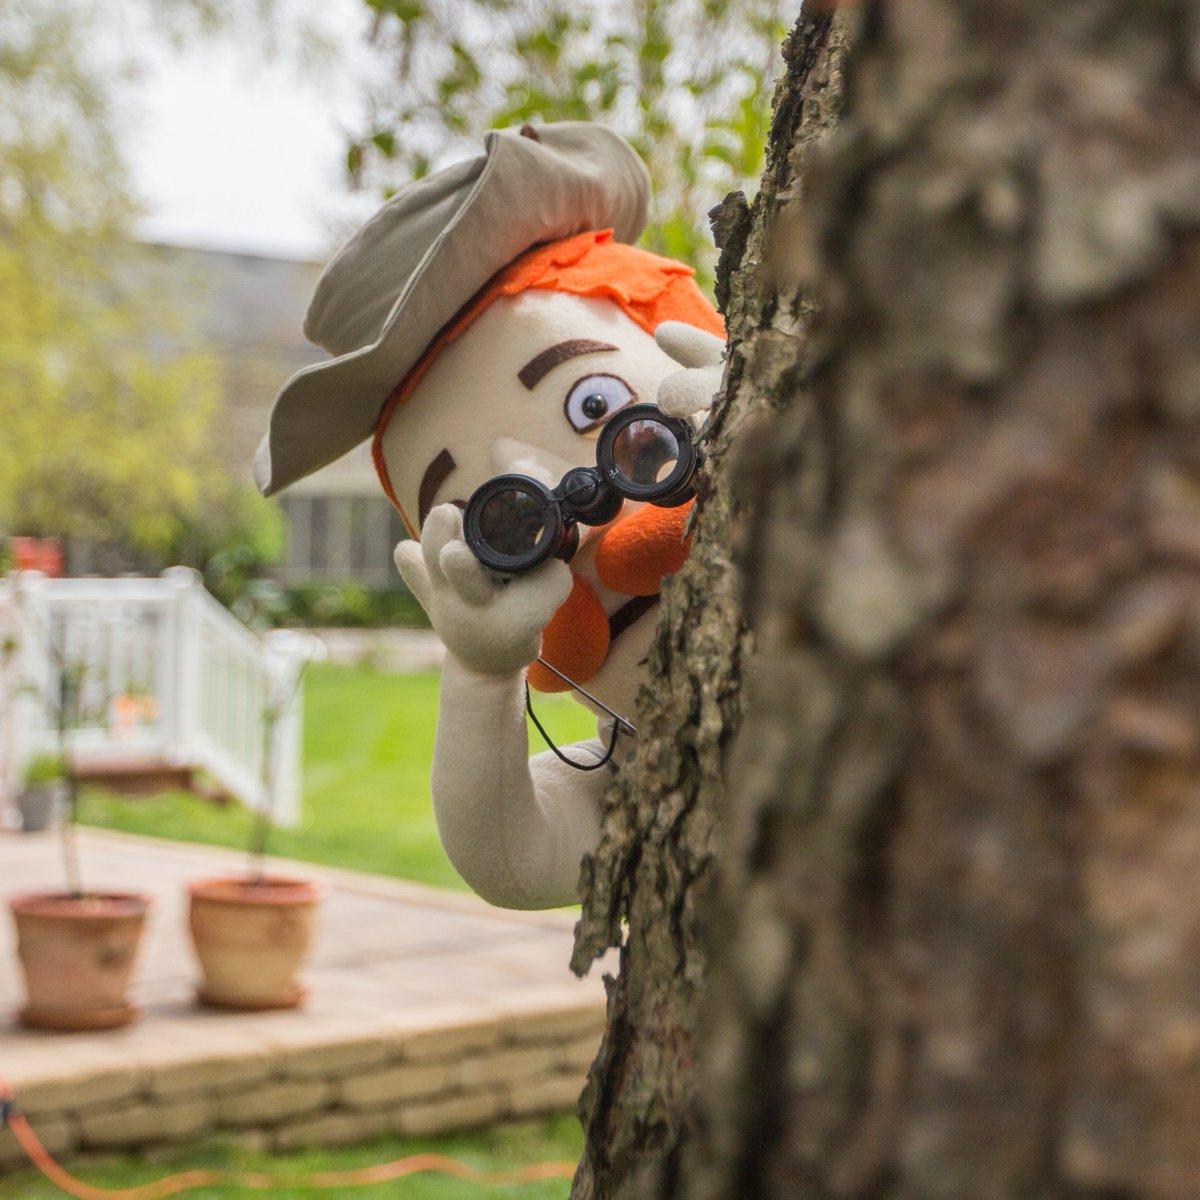 Bigfoot lawn ornament - Mosquito Hunters Big Foot Media John Shaw And 3 Others